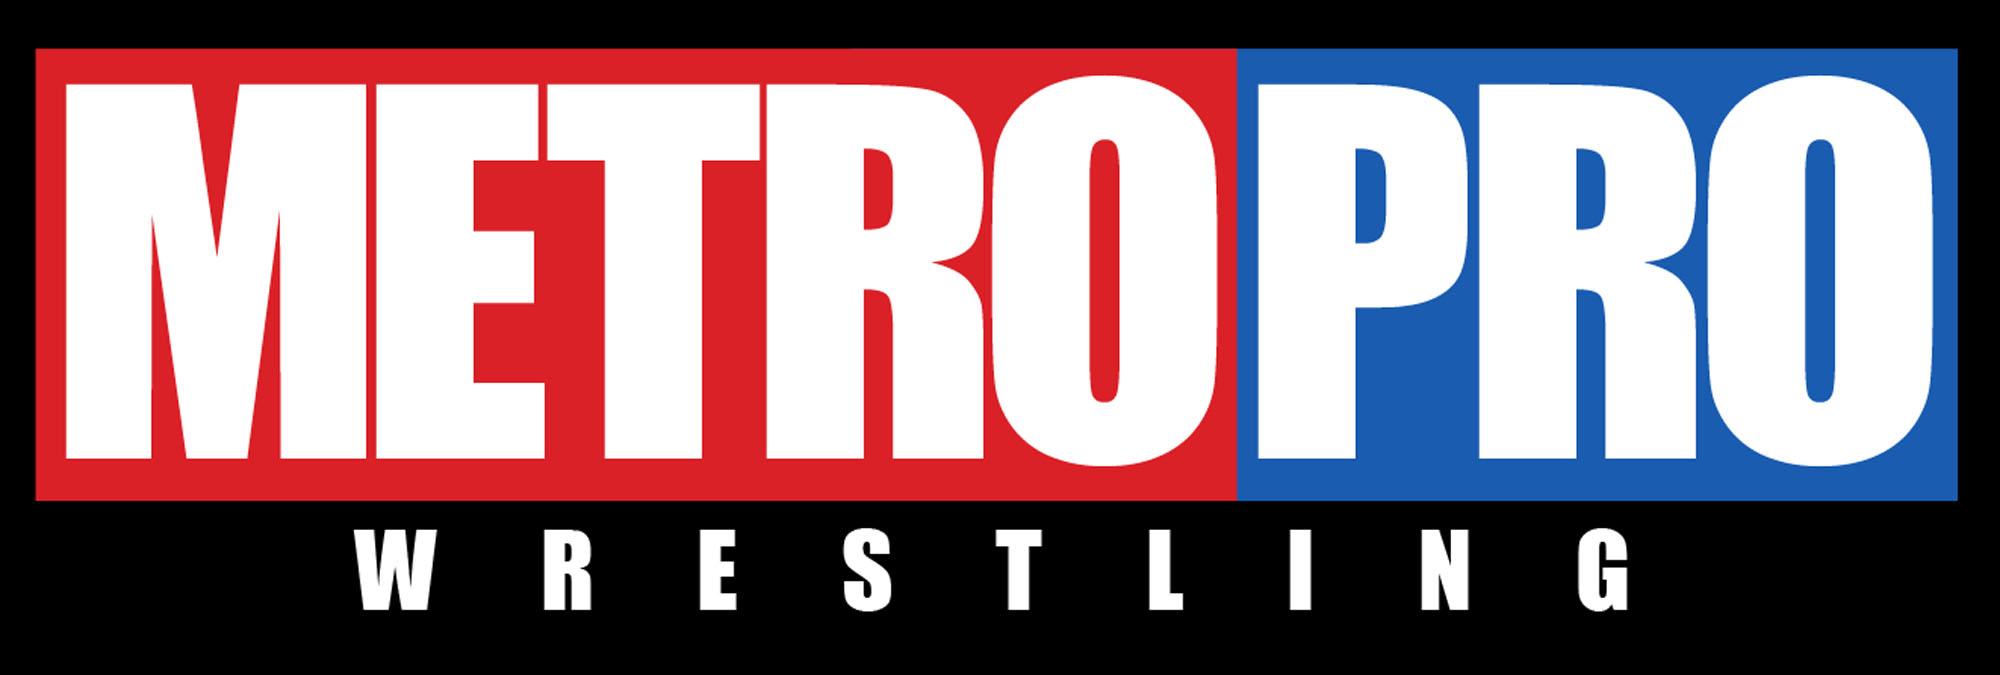 Metro Pro Wrestling - Wikipedia